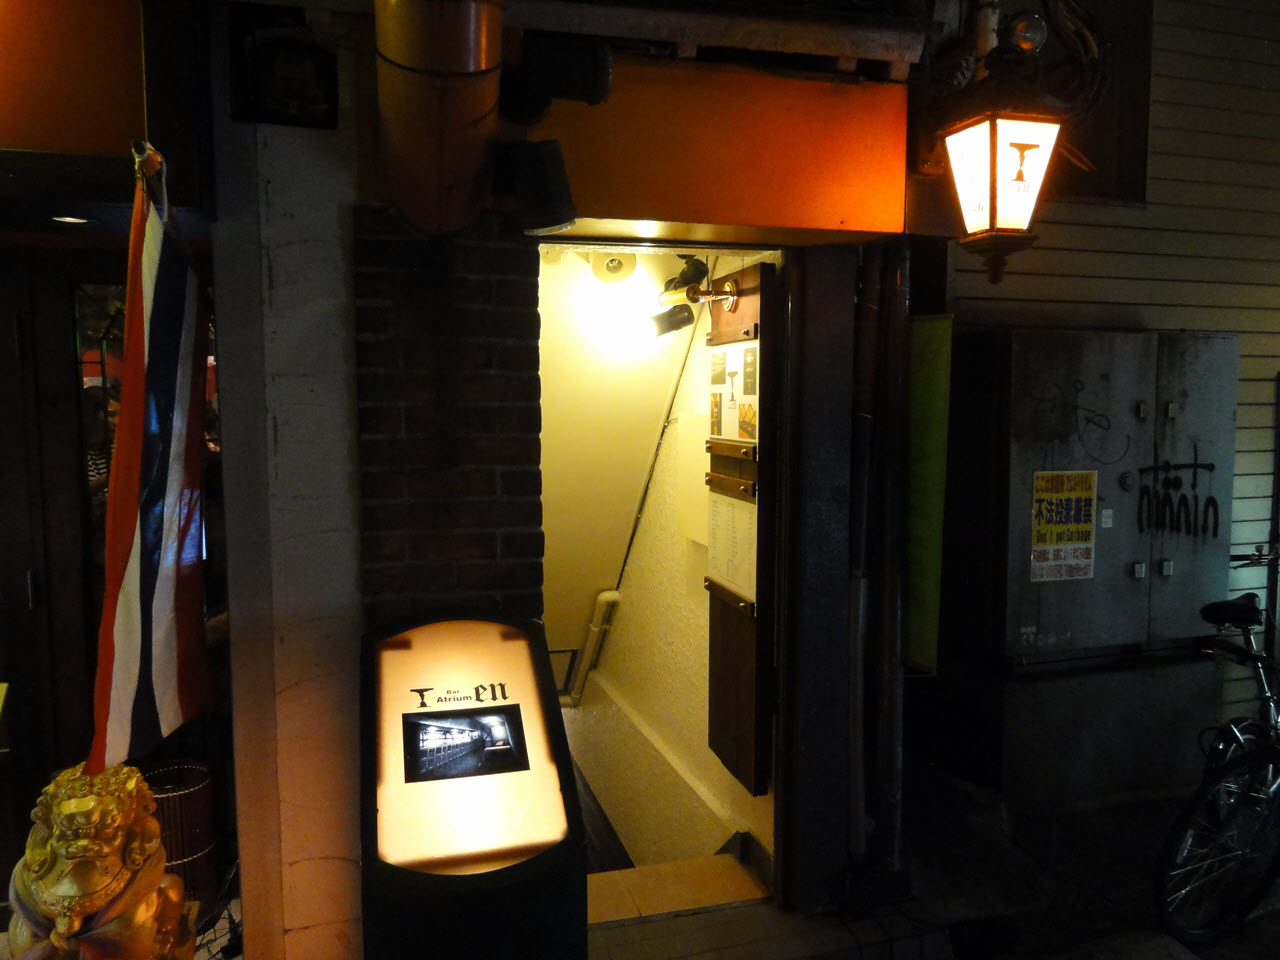 Bar Atrium en, Japan - entrance